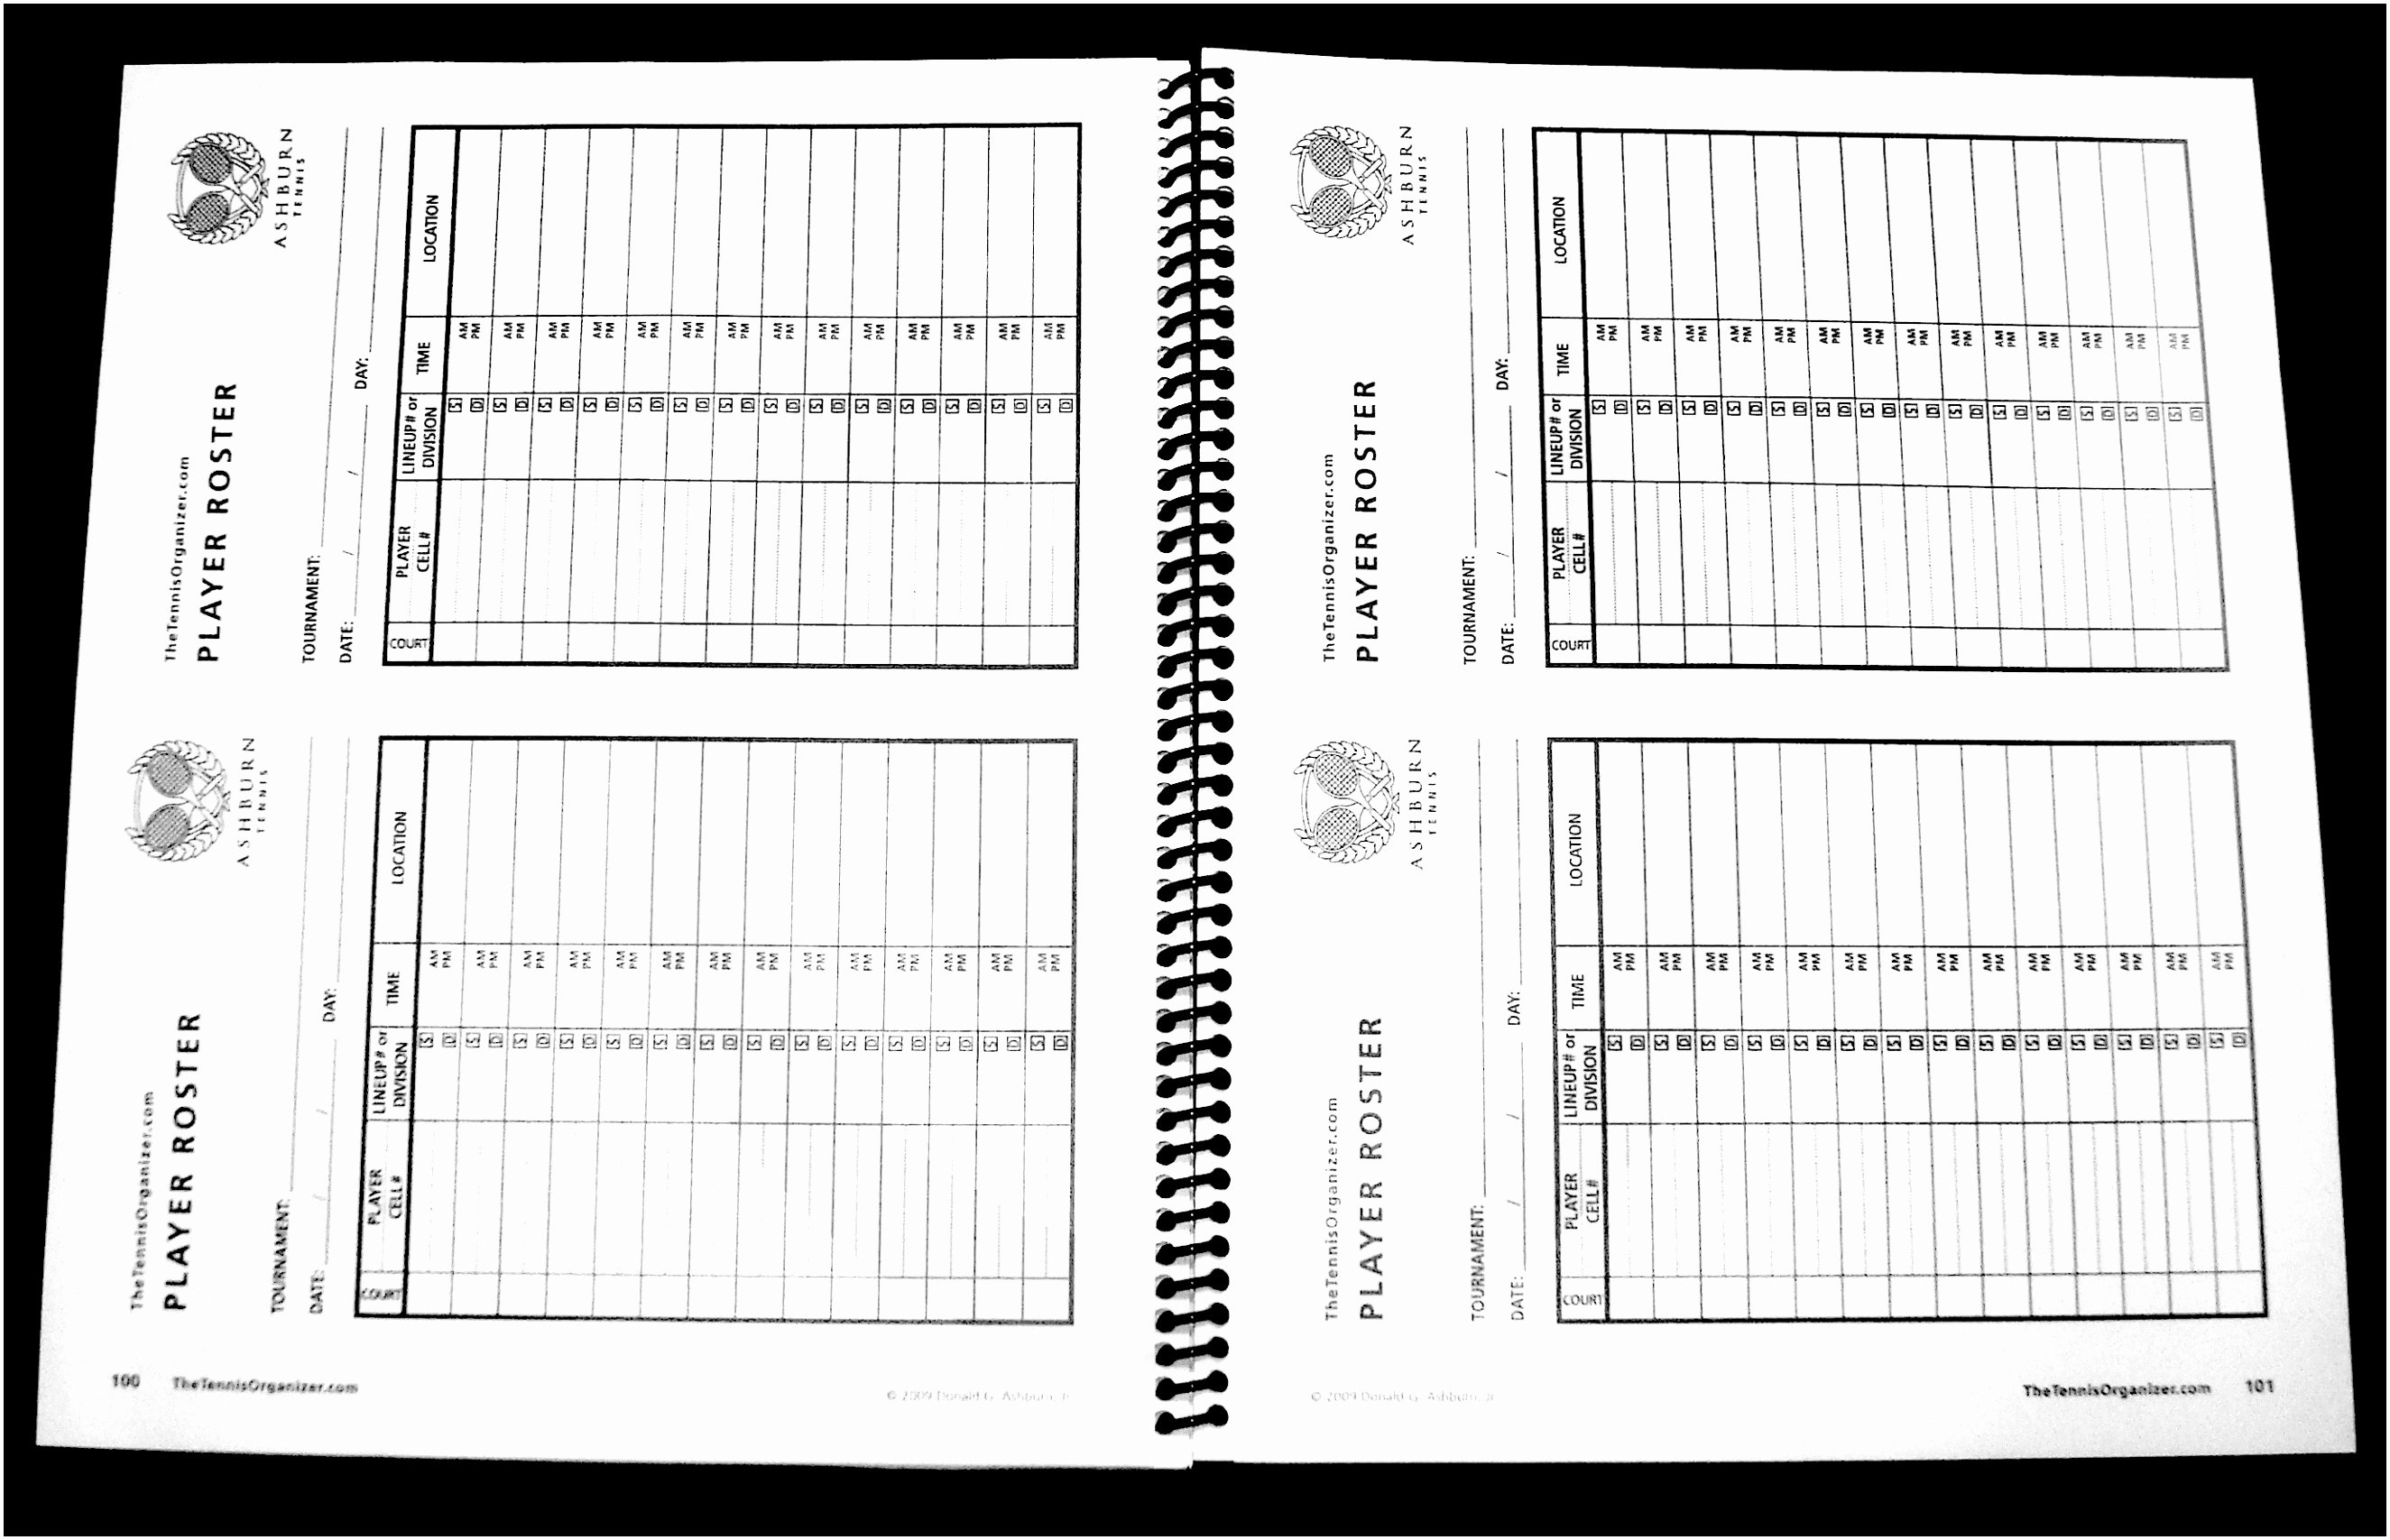 Football Depth Chart Template Excel Beautiful Football Depth Chart Template Excel format – thedl